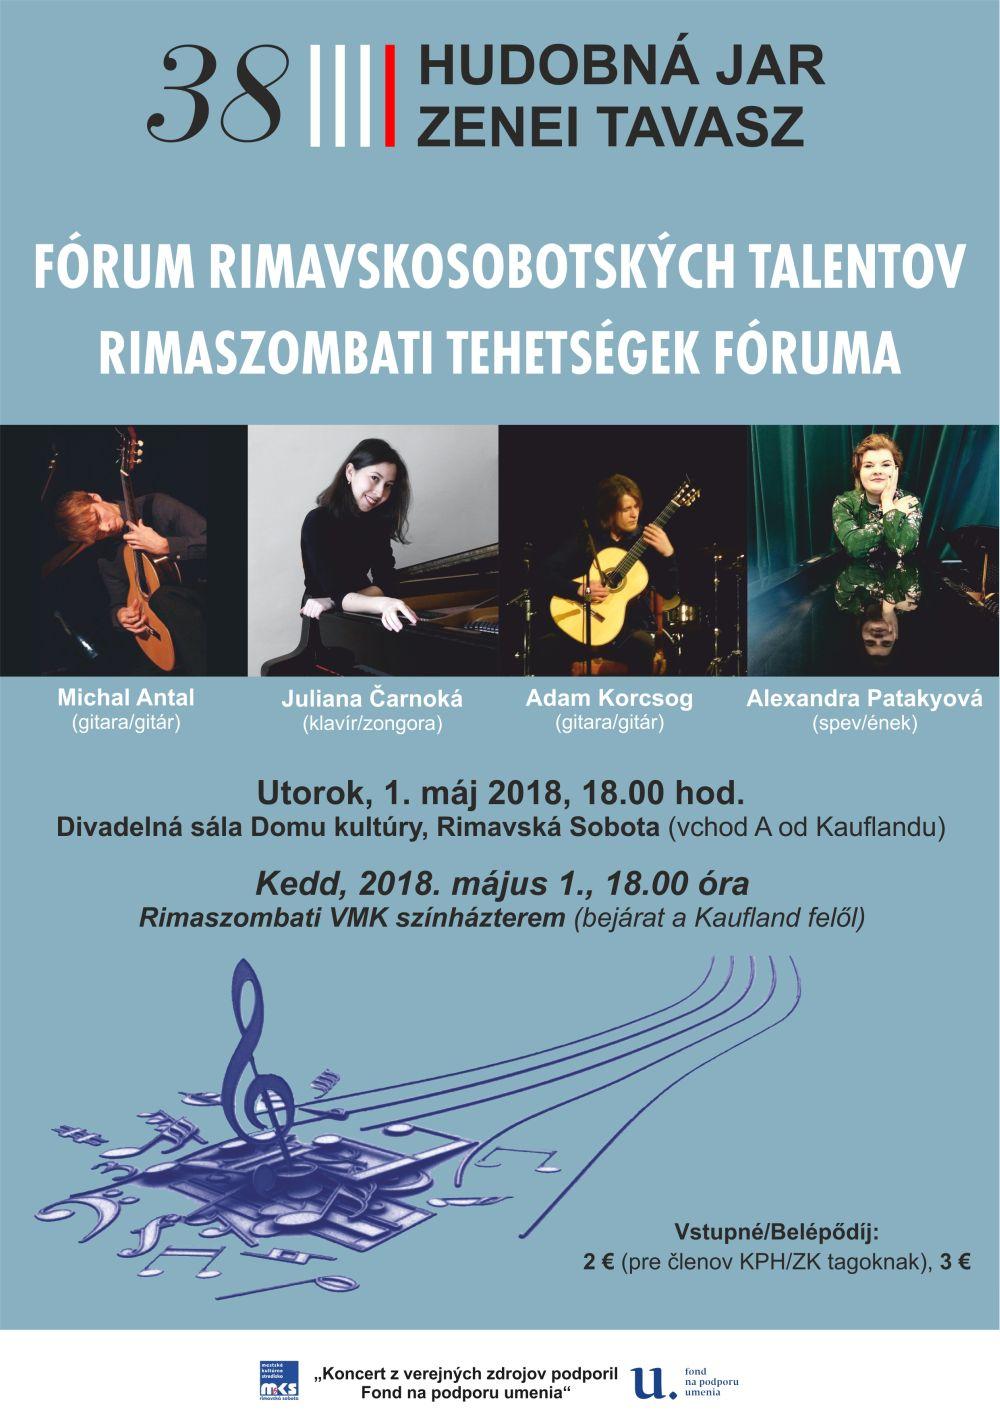 Forum rimavskosobotských talentov @ Divadelná sála Domu kultúry Rimavská Sobota | Banskobystrický kraj | Slovensko